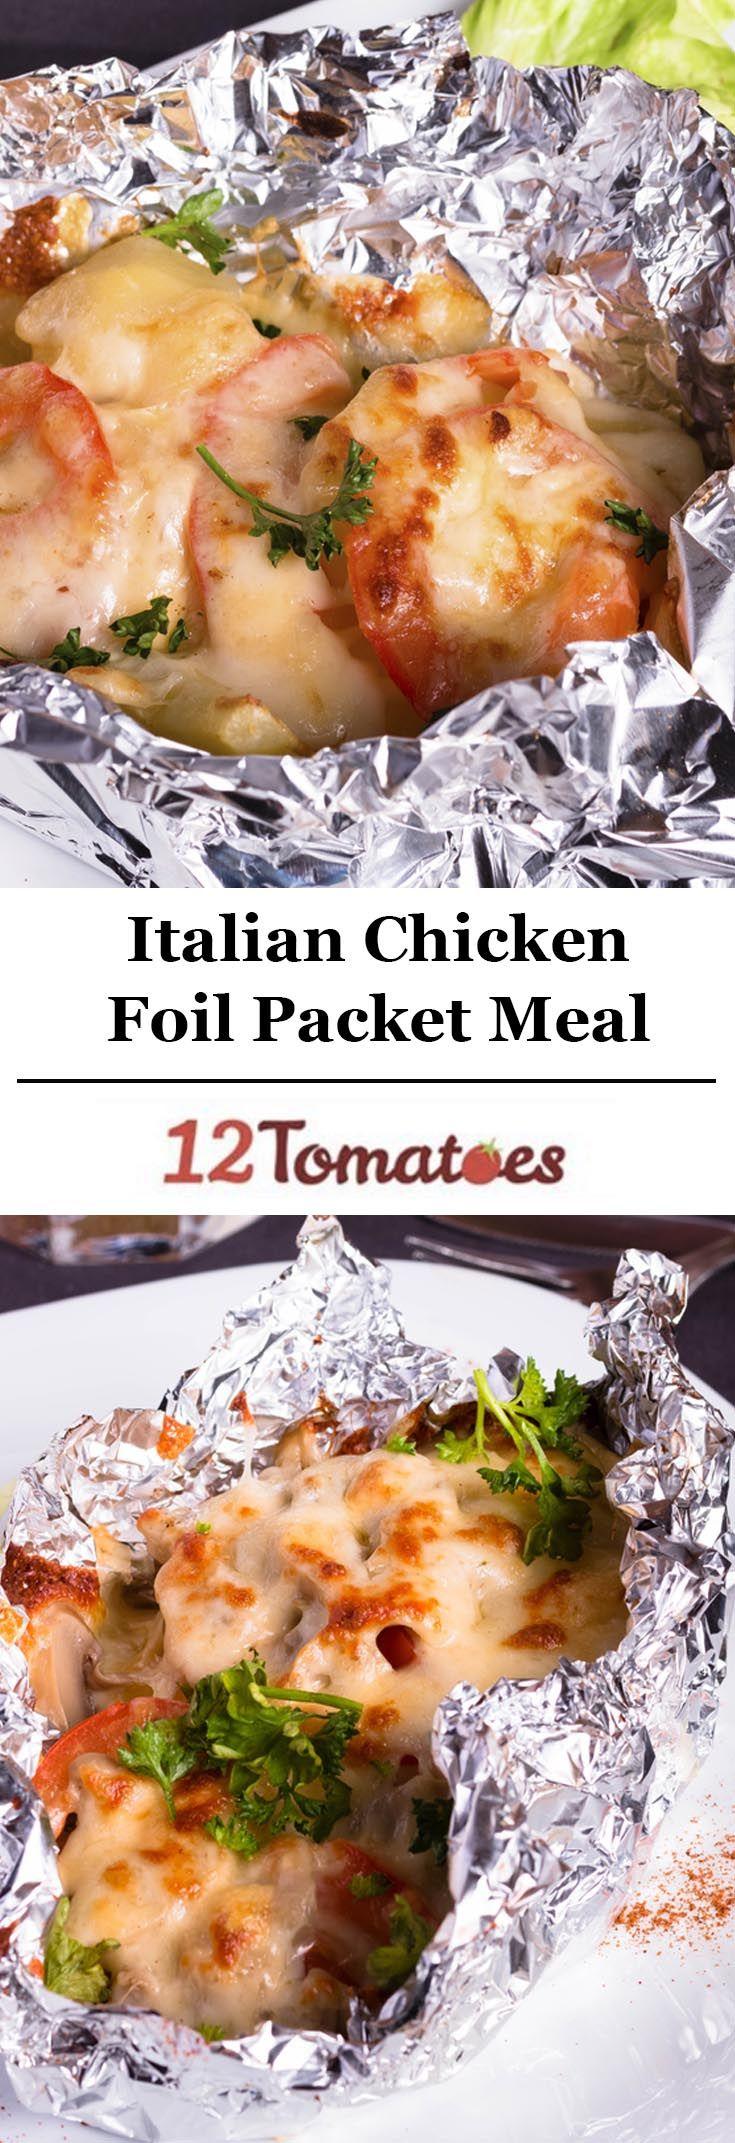 Italian Chicken Foil Packet